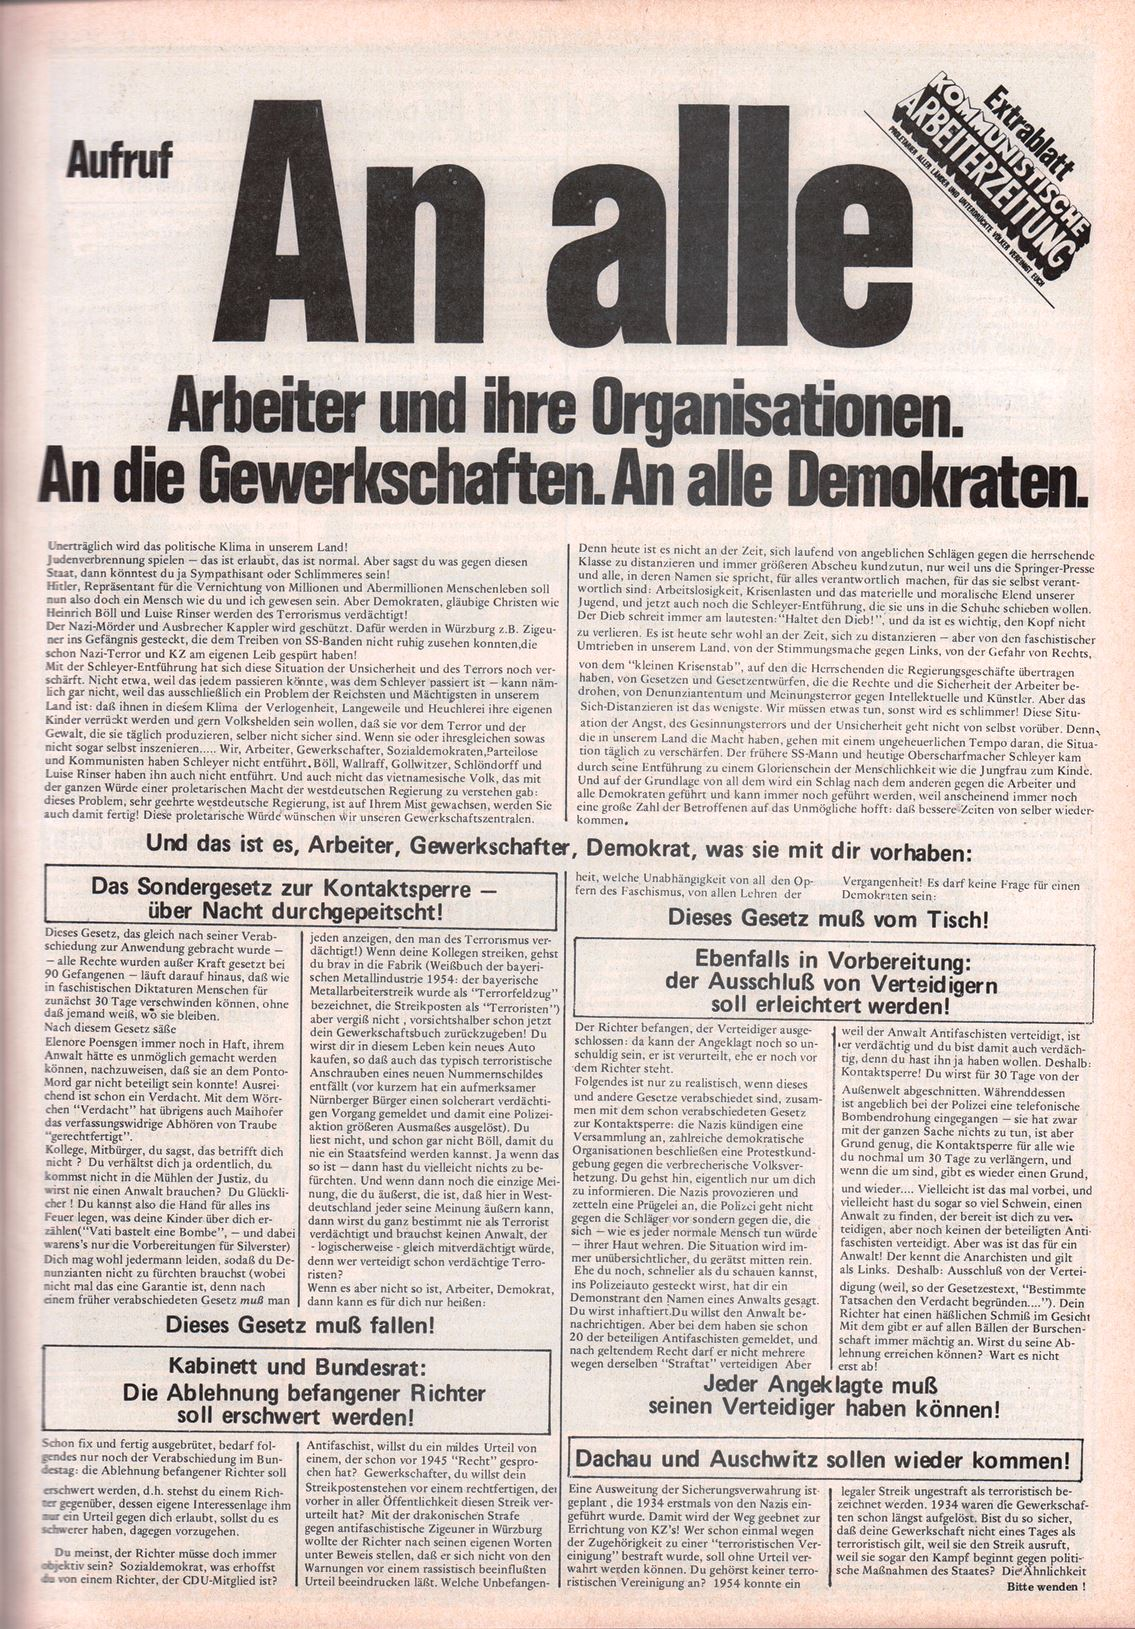 ABG_KAZ_1977_376